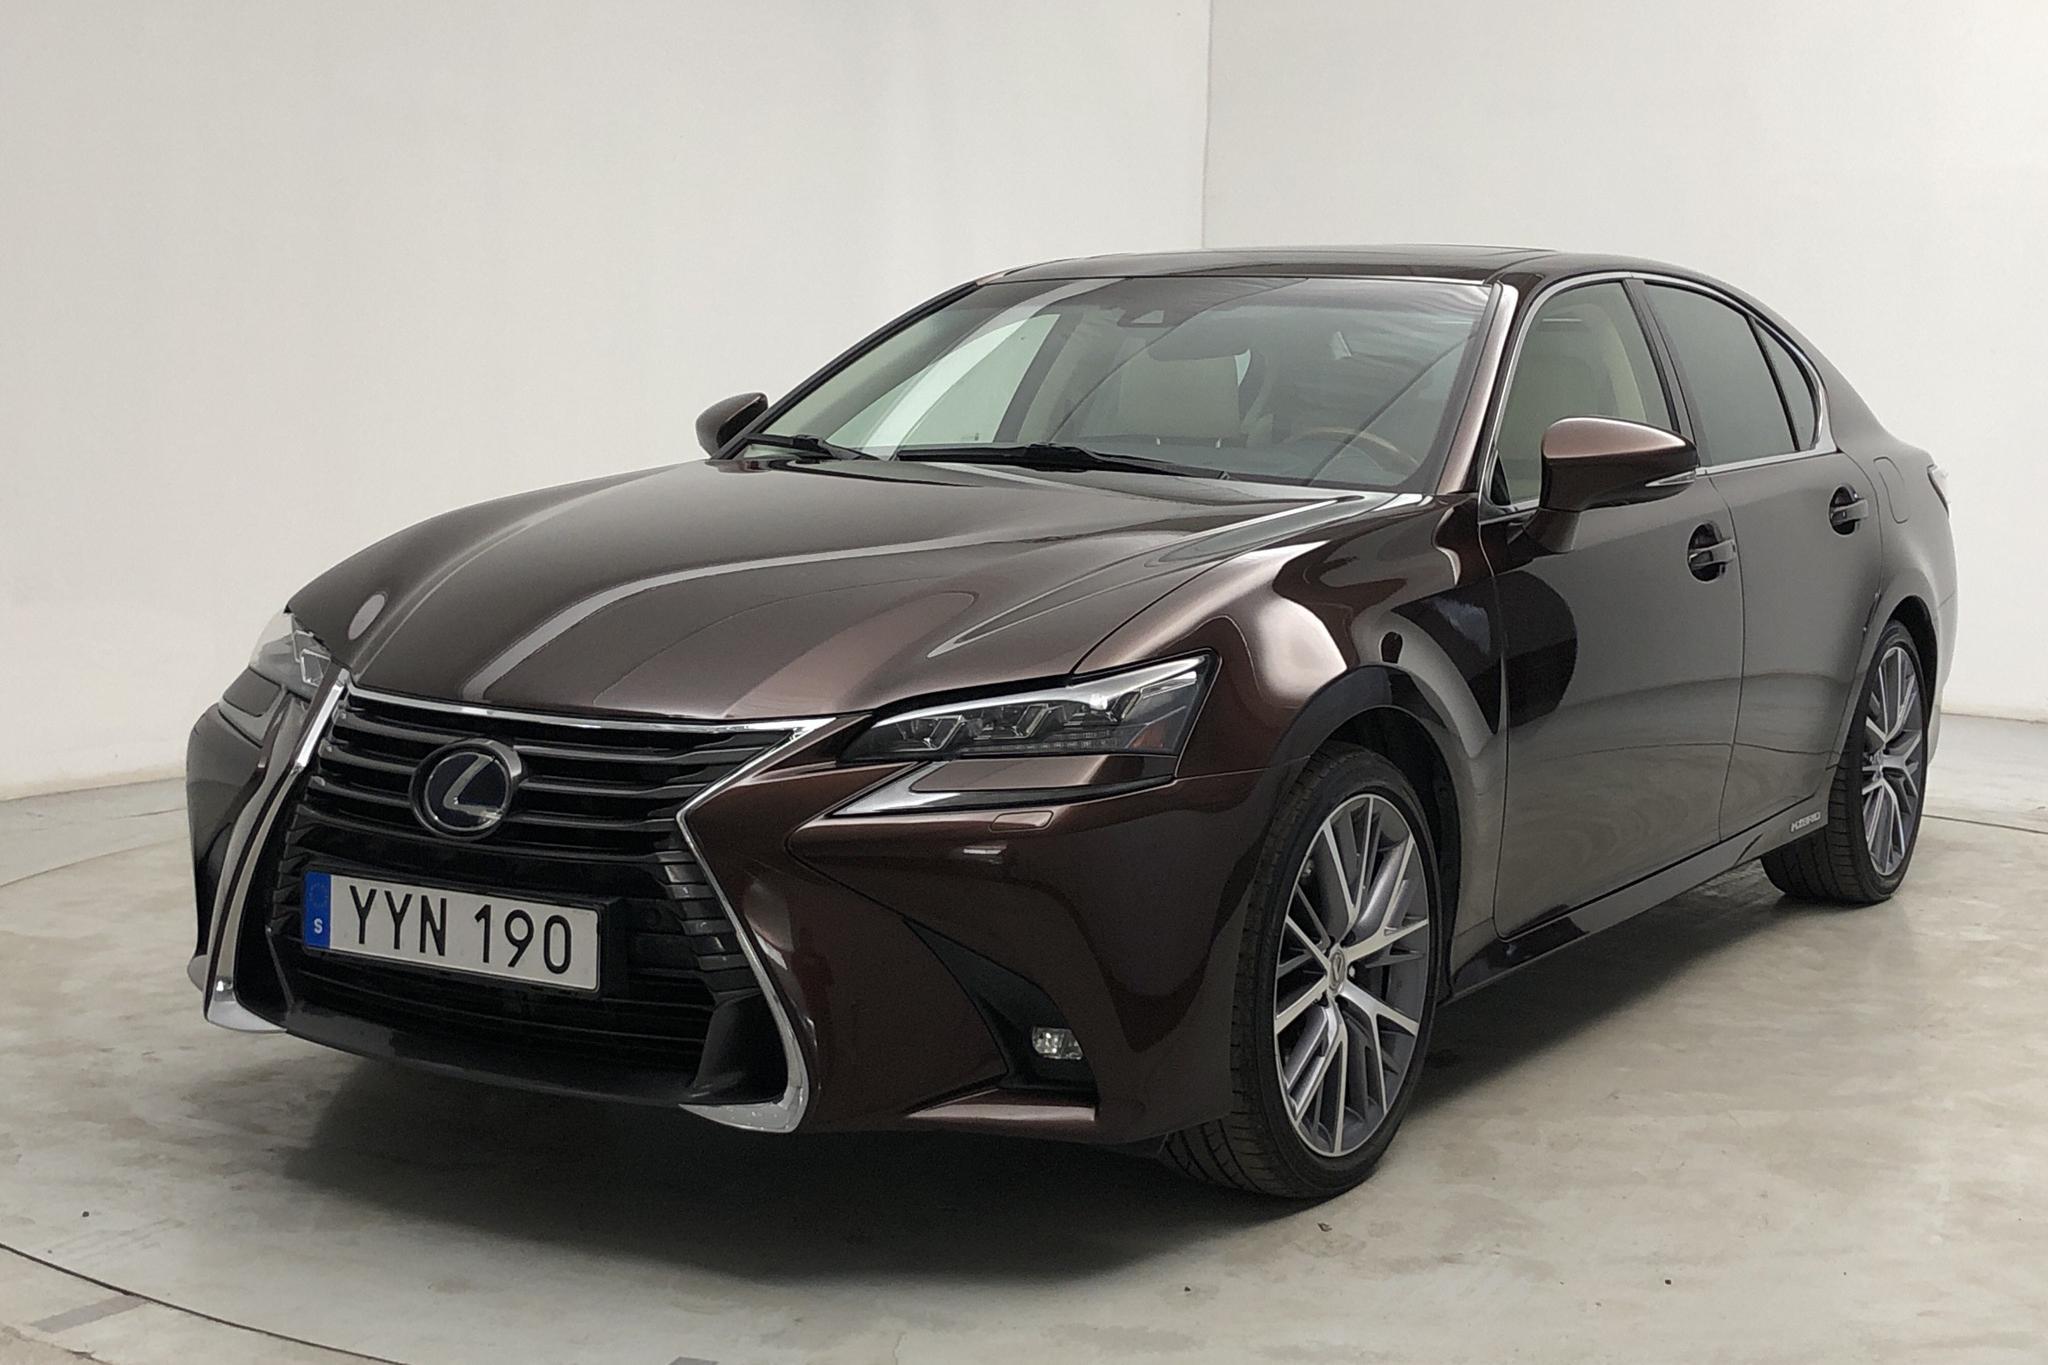 Lexus GS 450h (345hk) - 81 840 km - Automatic - brown - 2018